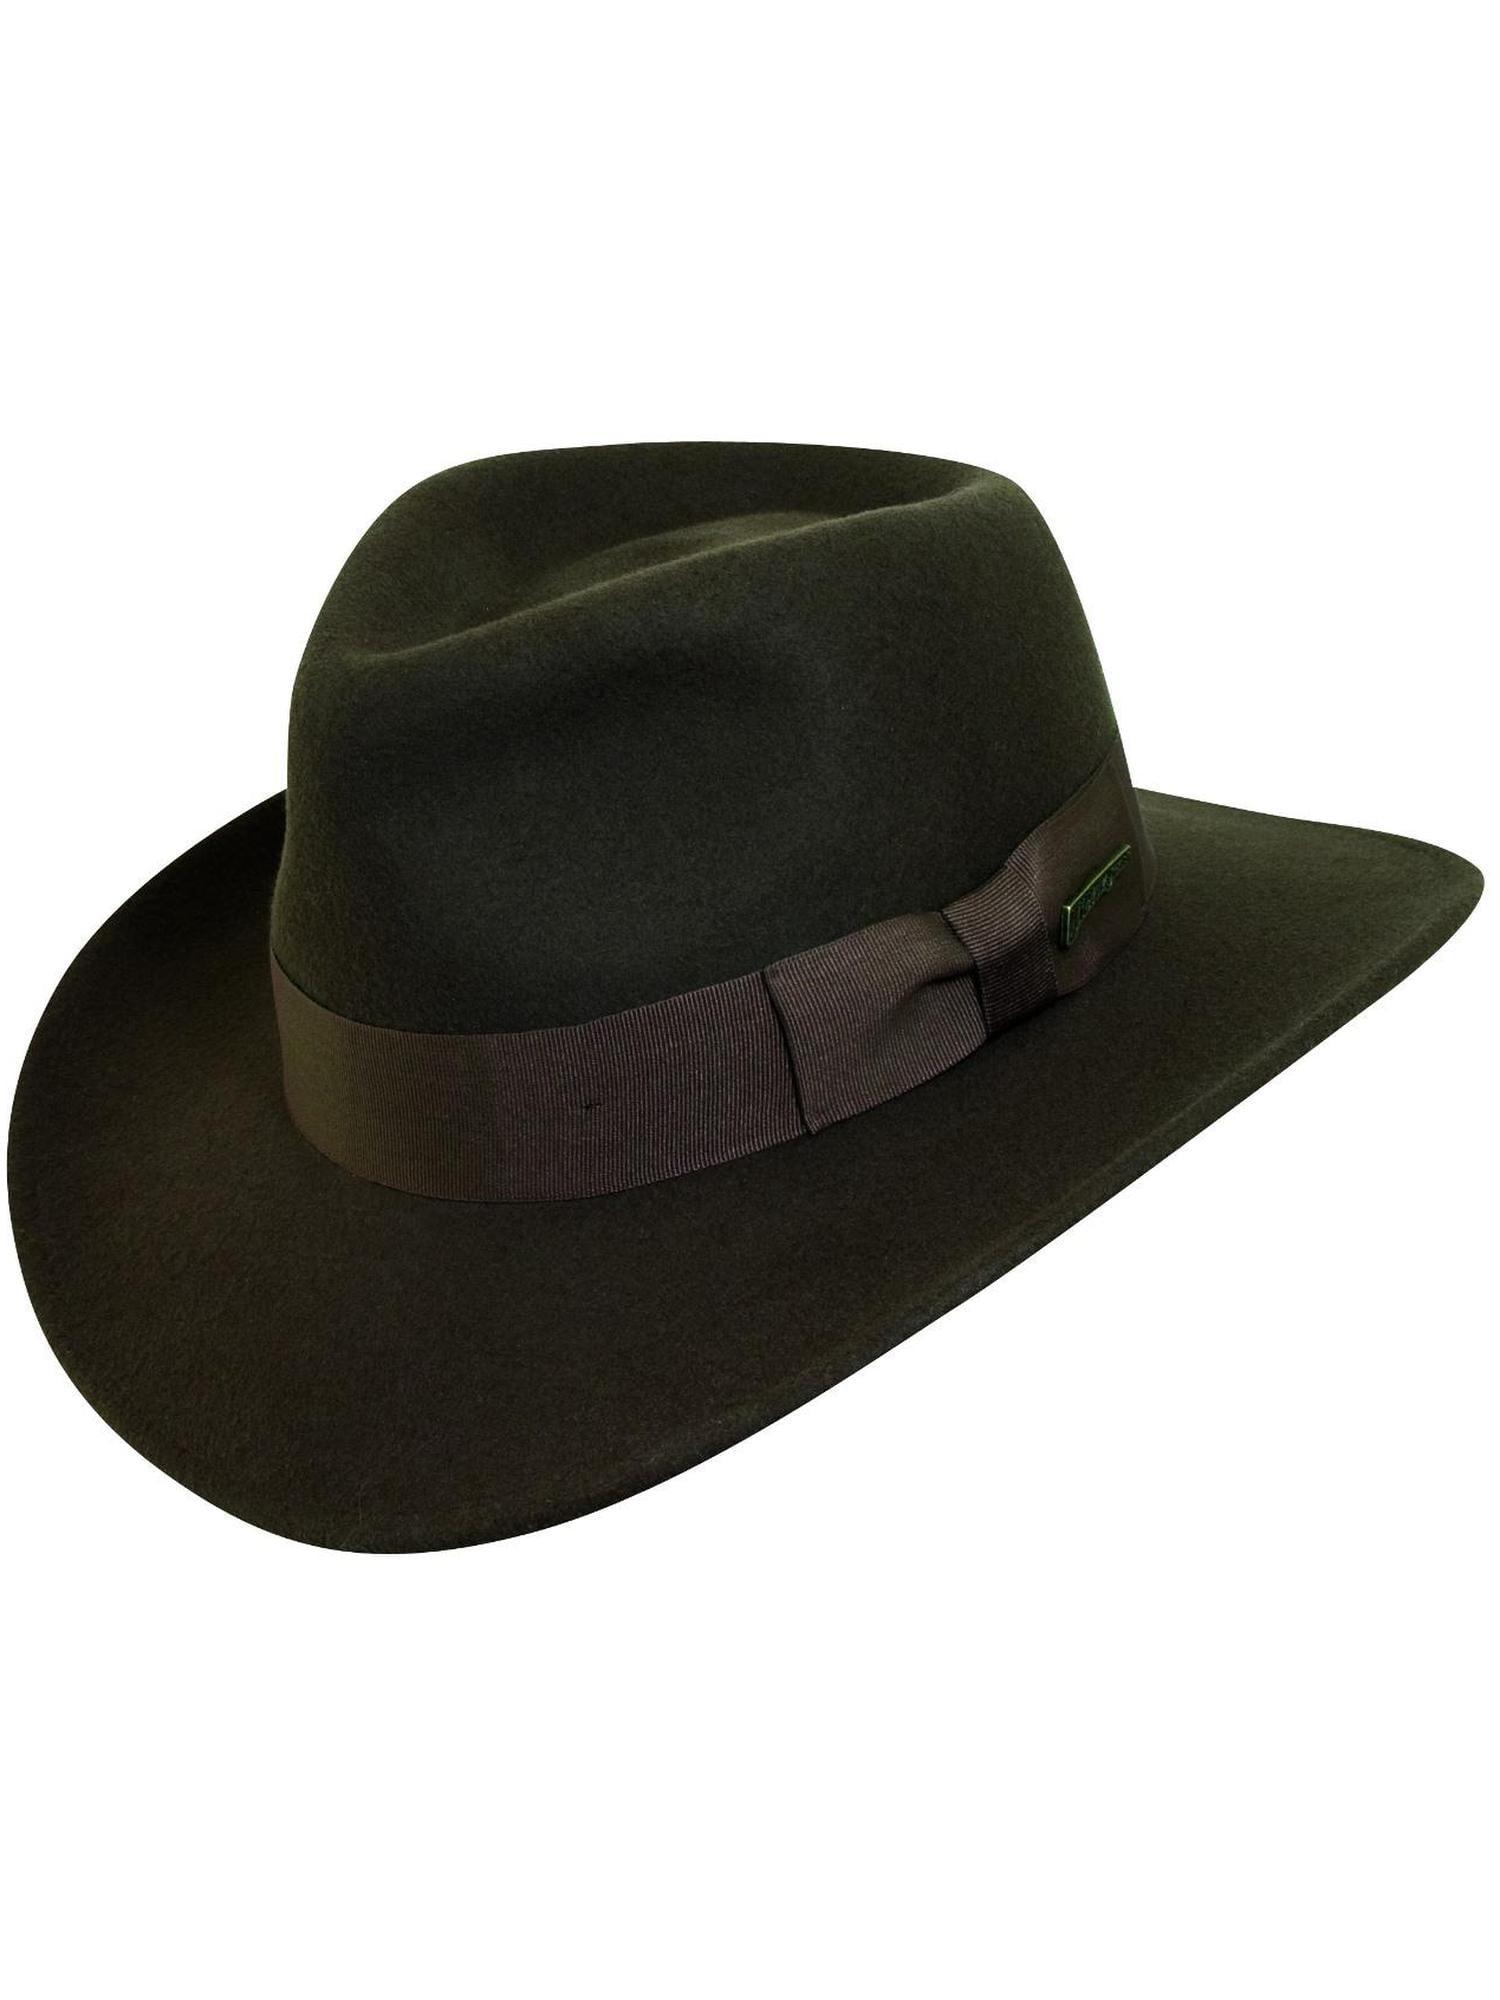 b325f909d17 ... shopping dorfman pacific mens indiana jones wool felt crushable outback  hat walmart 8cee9 dde93